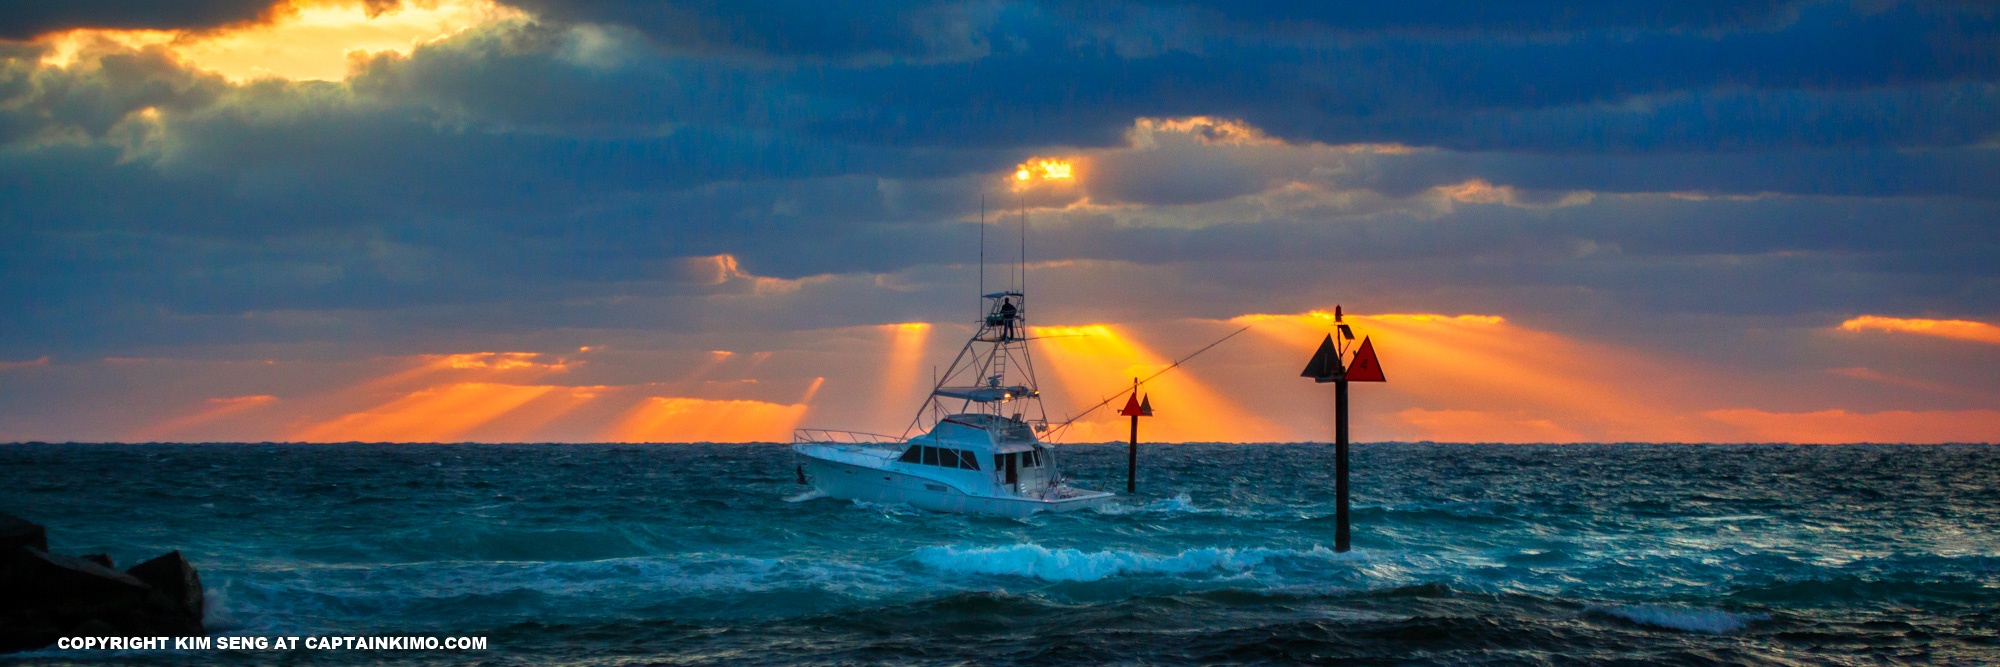 Salt Life Ocean Fishing Boat Sunrise Pompano Beach